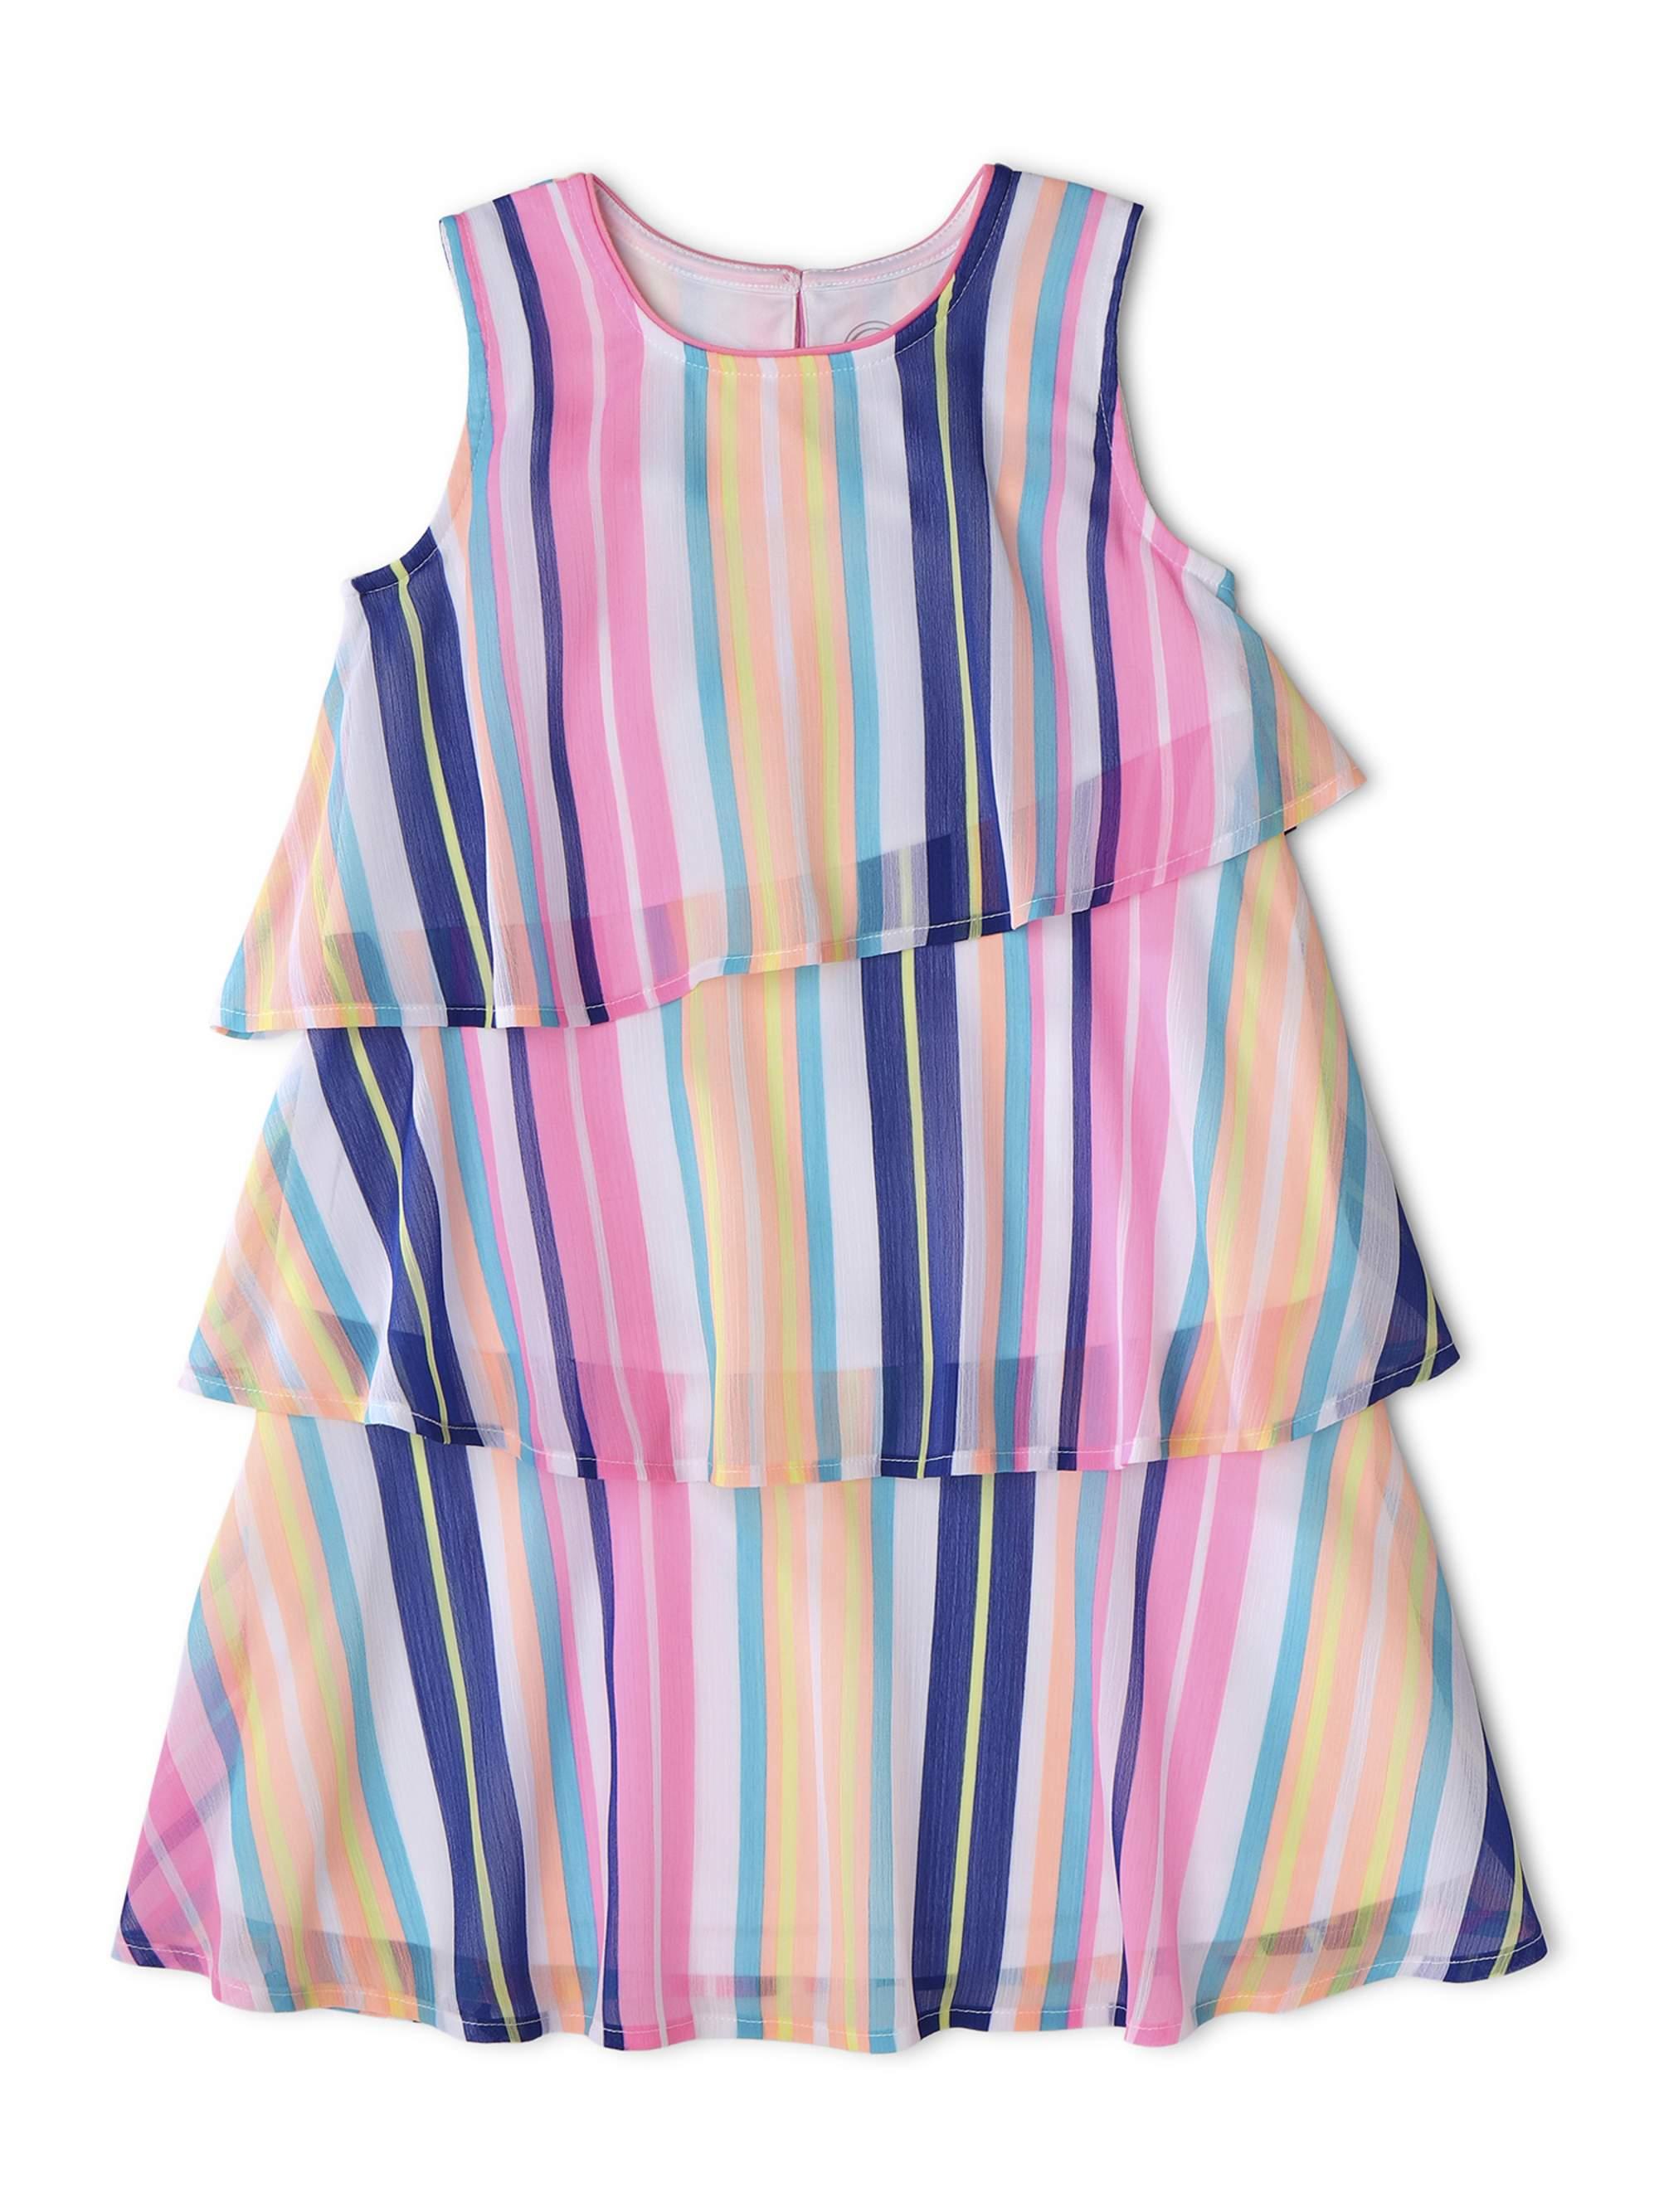 Report incorrect product information Wonder Nation  Wonder Nation Girls Layered Chiffon Ruffle Dress, Sizes 4-18 & Plus